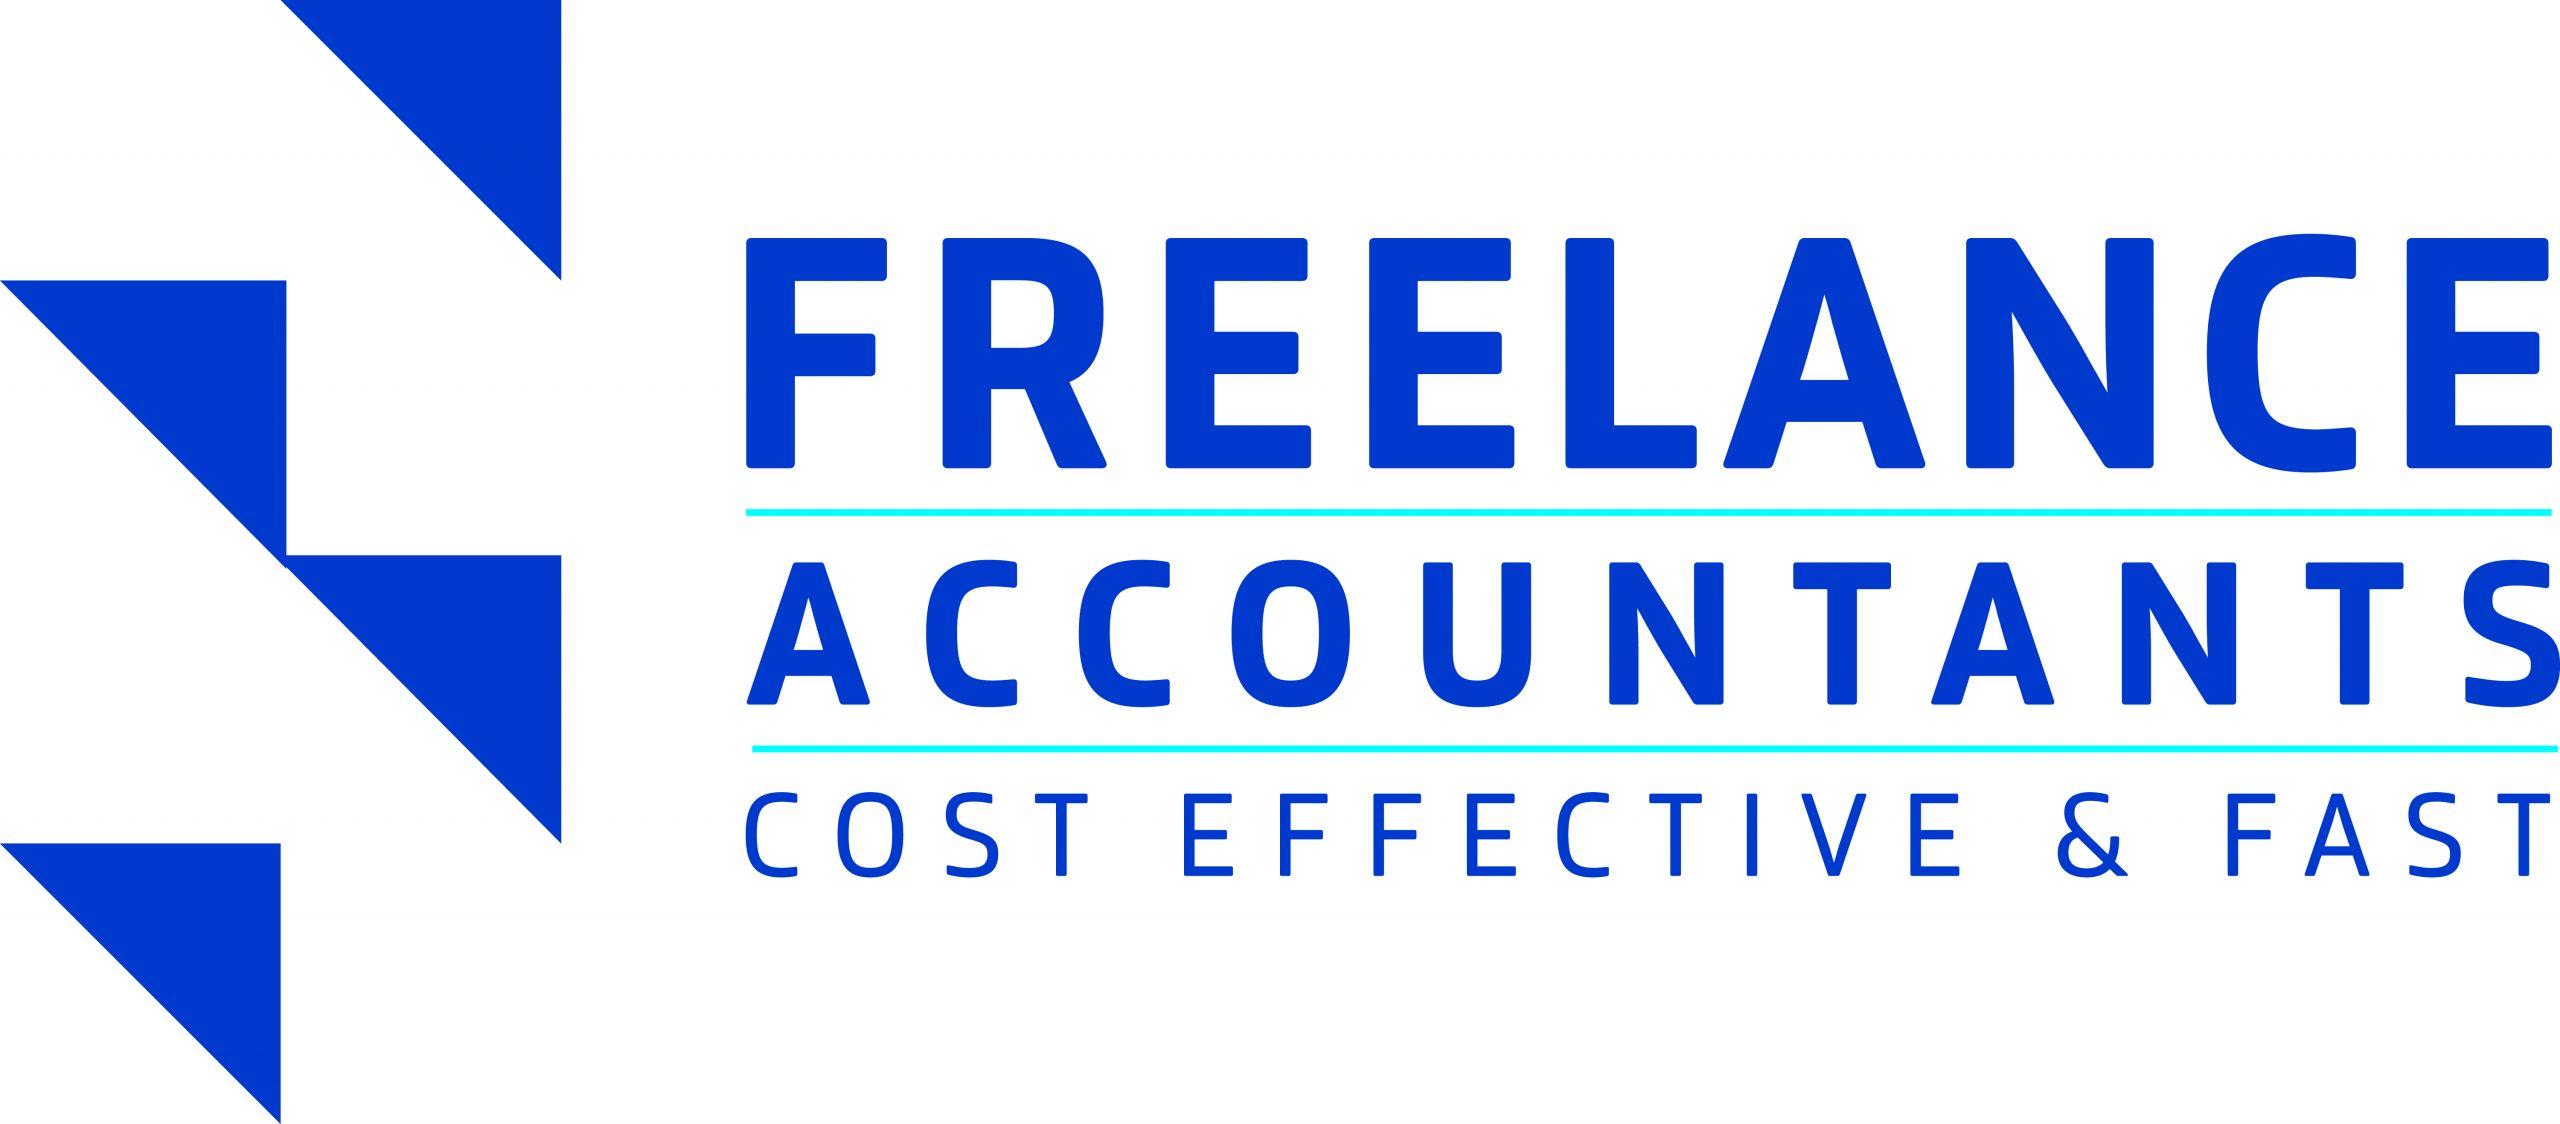 Freelance Accountants